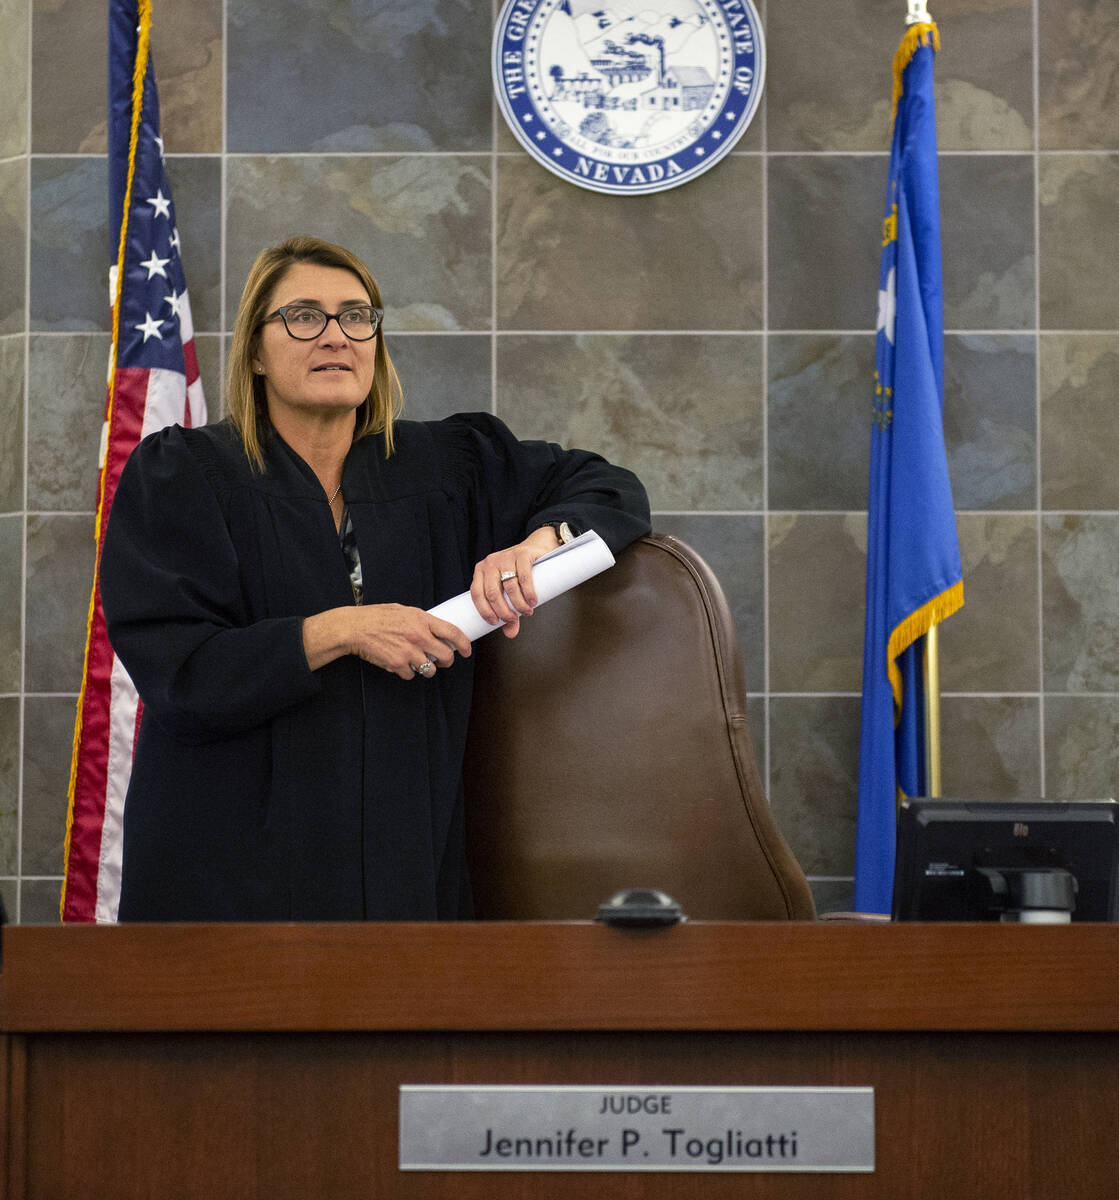 District Judge Jennifer Togliatti appears in her courtroom at the Regional Justice Center in La ...